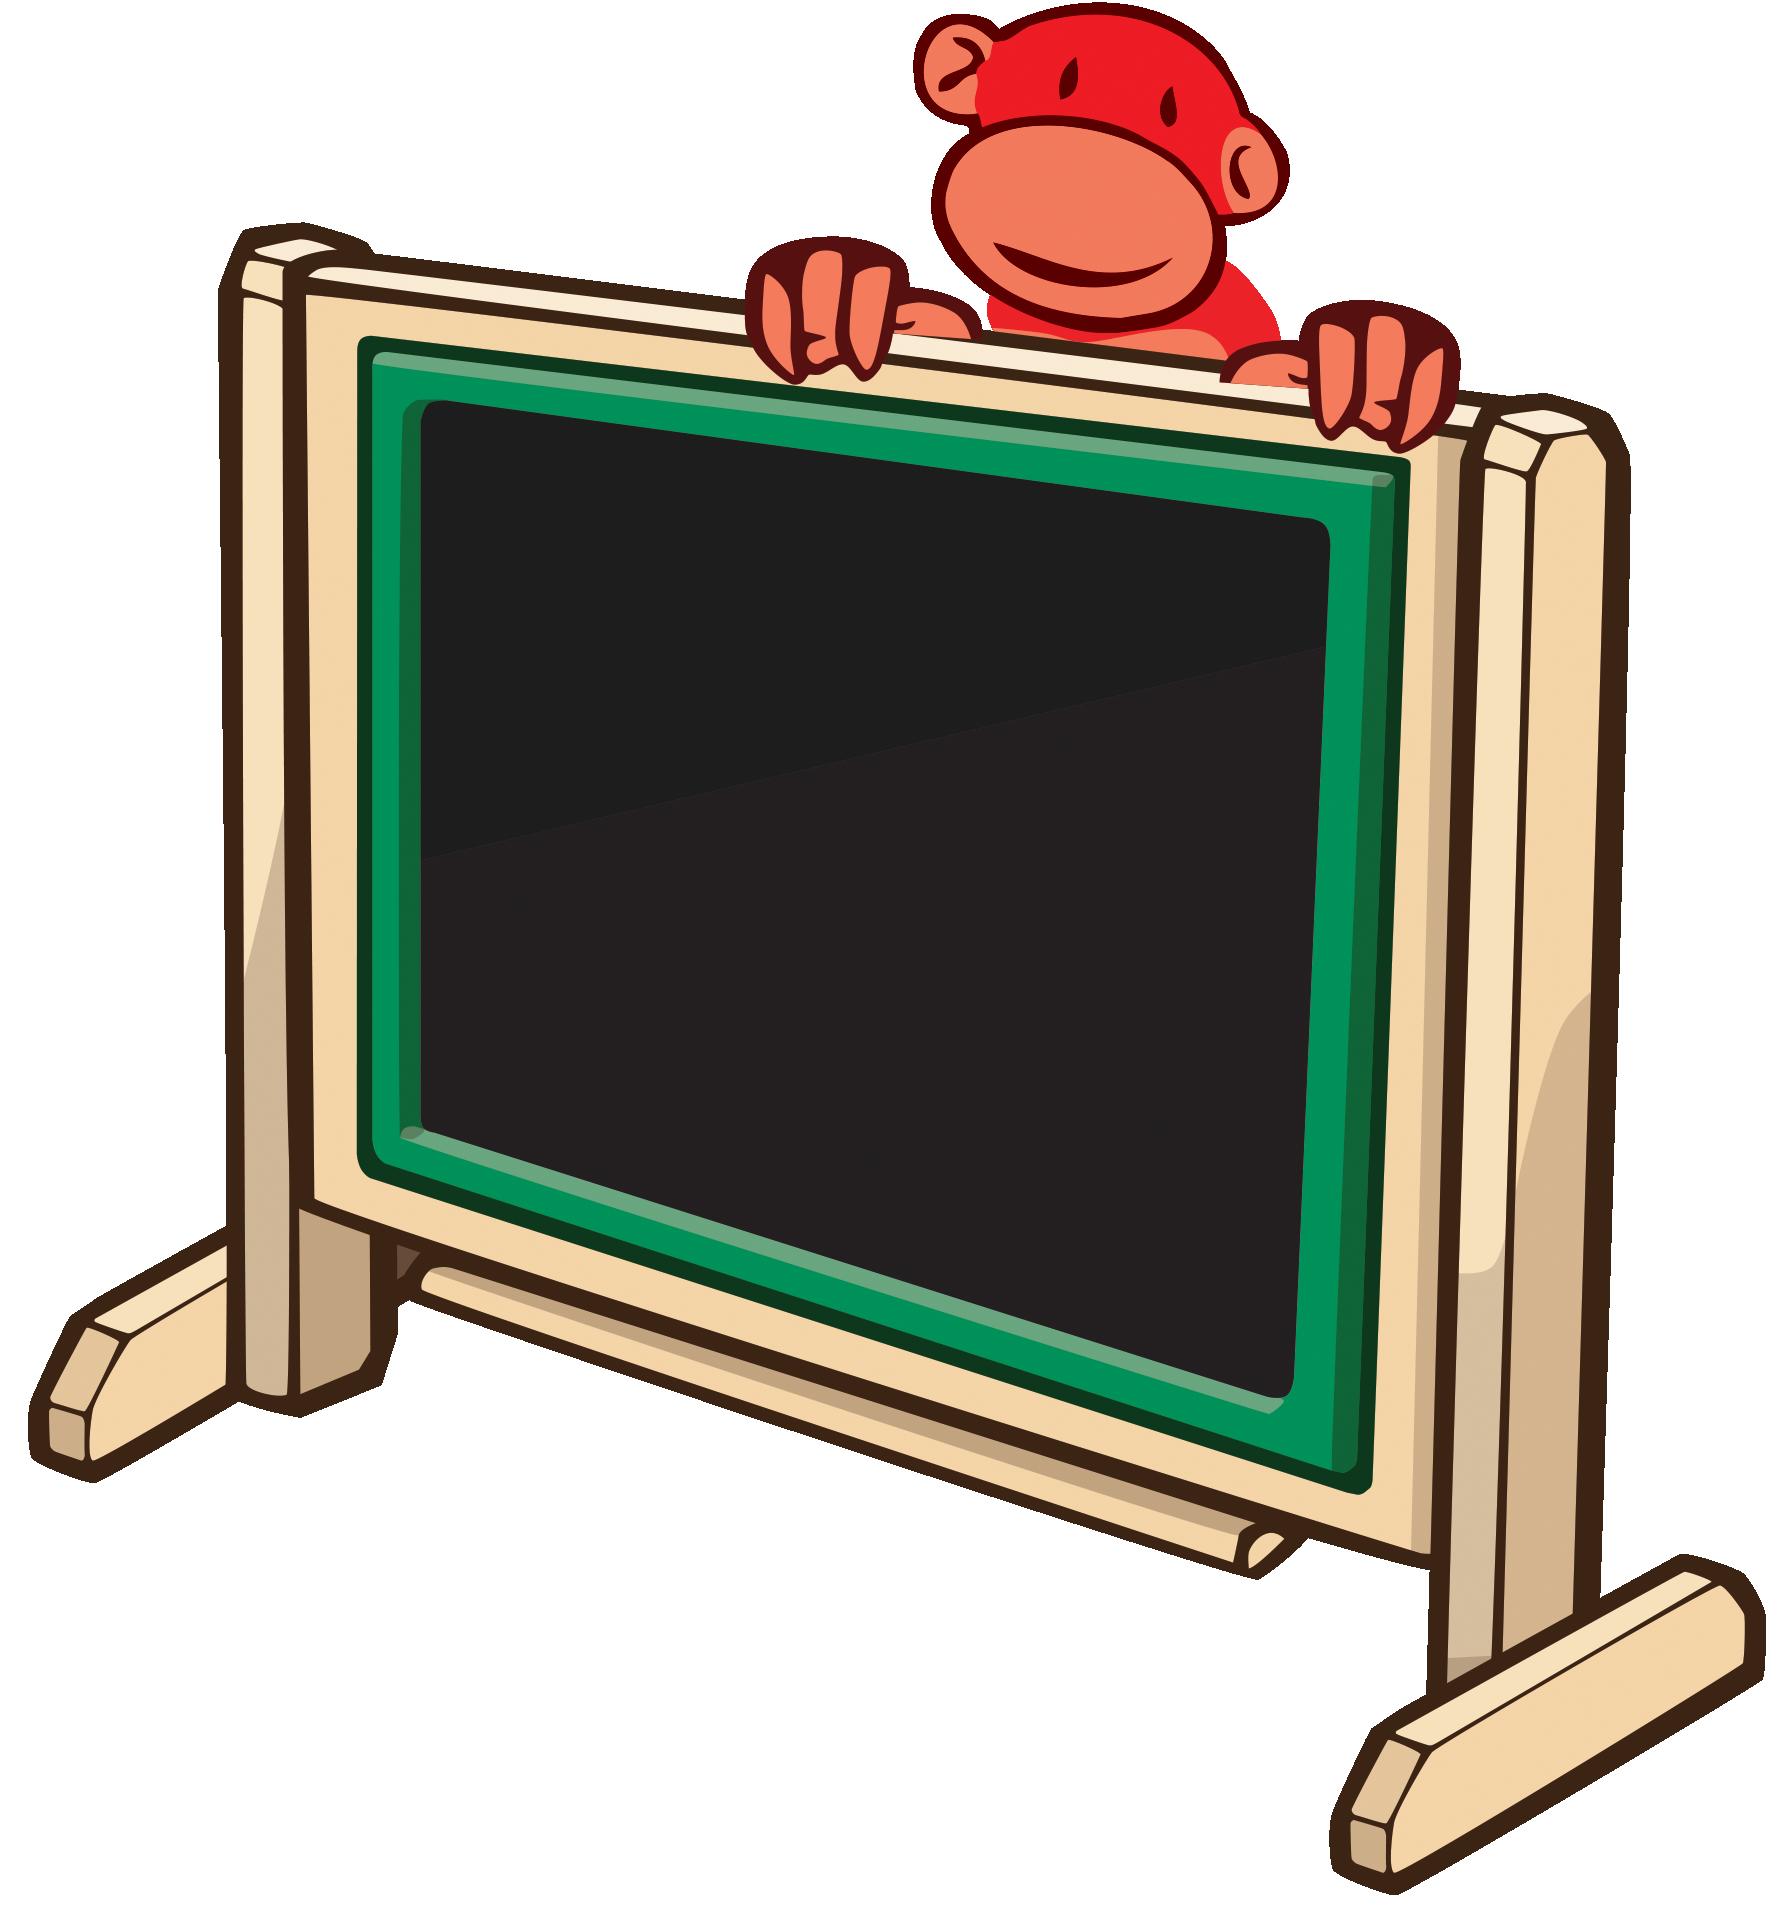 Arts red monkey chalk. Playground clipart school environment